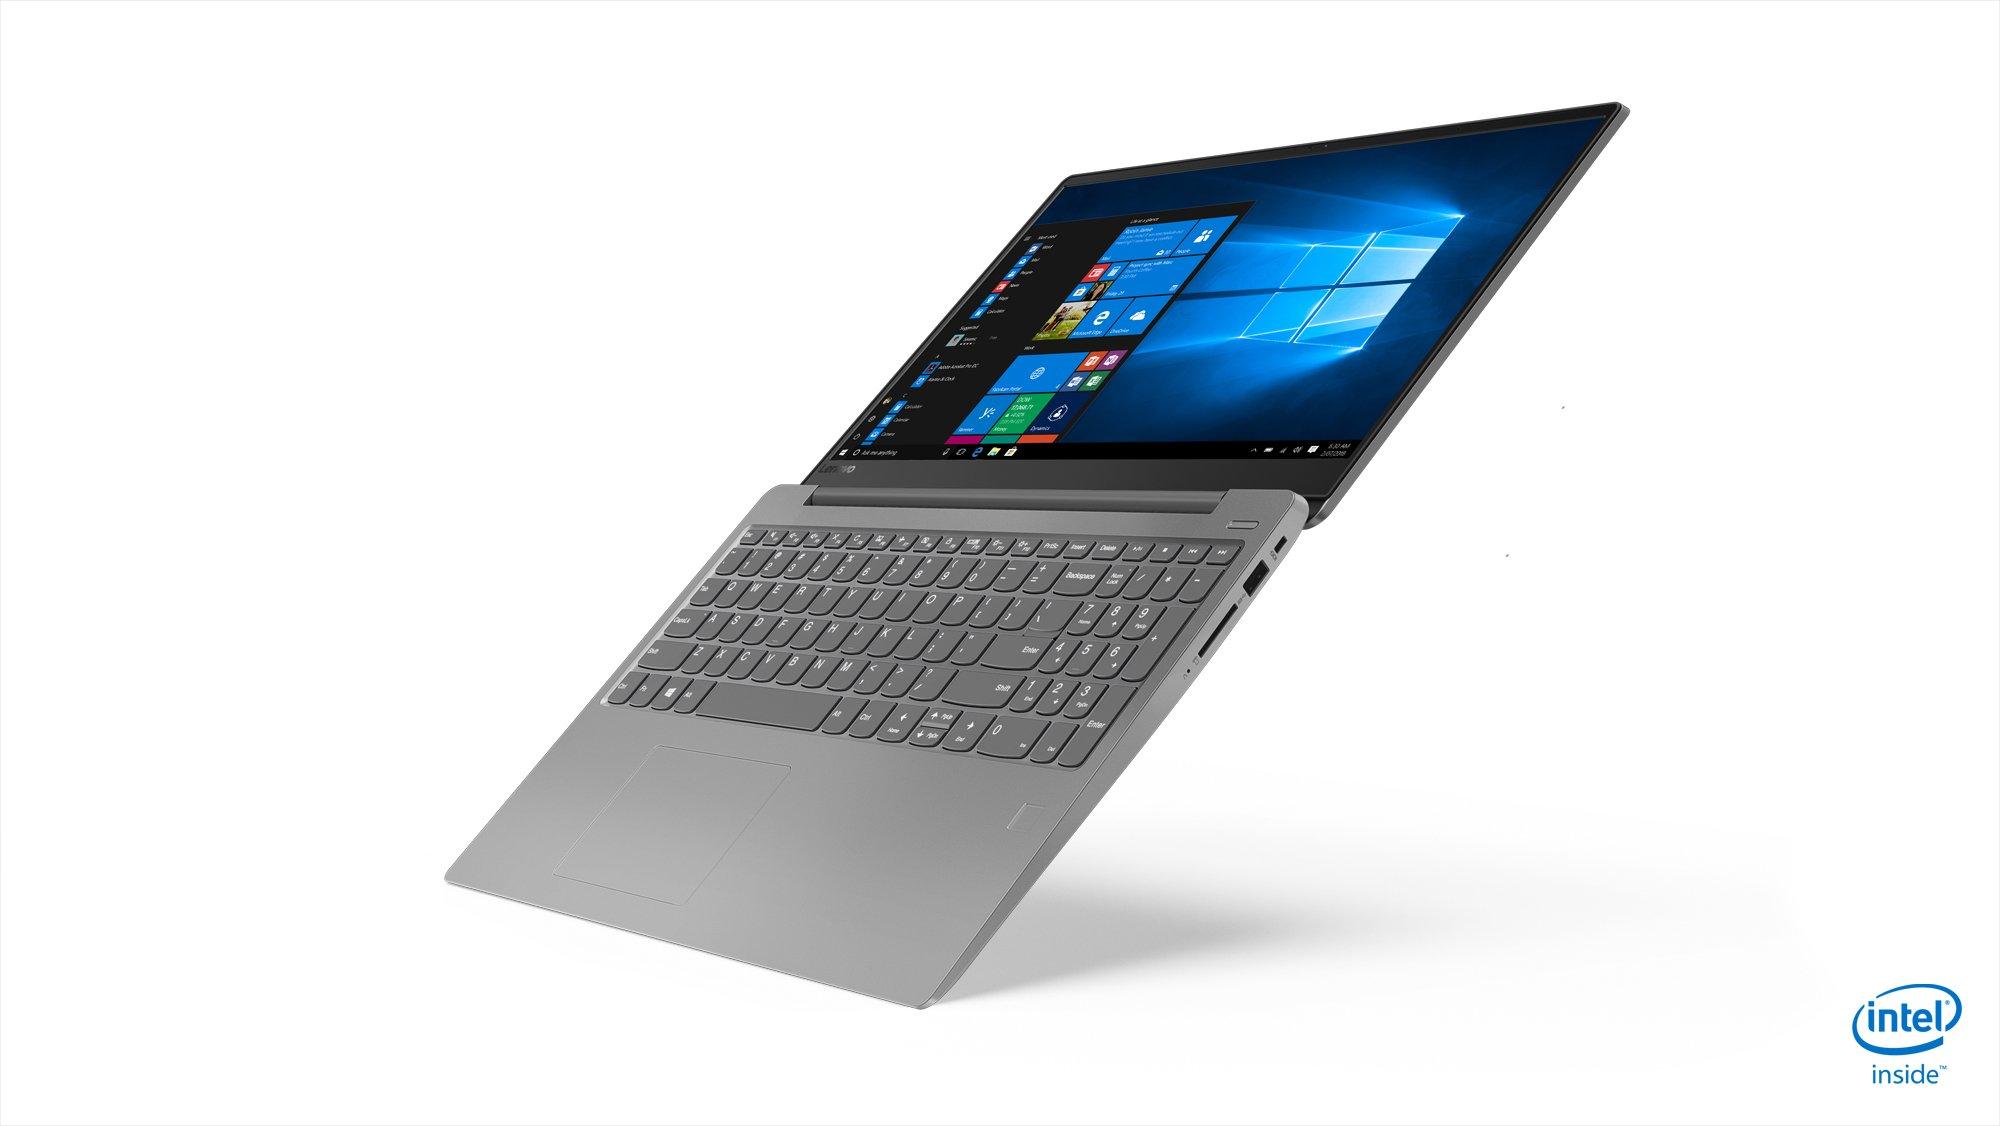 "Lenovo 15.6"" Ideapad 330S HD Performance Laptop (Intel Quad-Core i7-8550U CPU,8GB RAM,128GB SSD (boot),1TB HDD,WiFi,HDMI, USB-C, Webcam,SD Reader,Microfiber Clothes included, Windows 10) Platinum Grey"